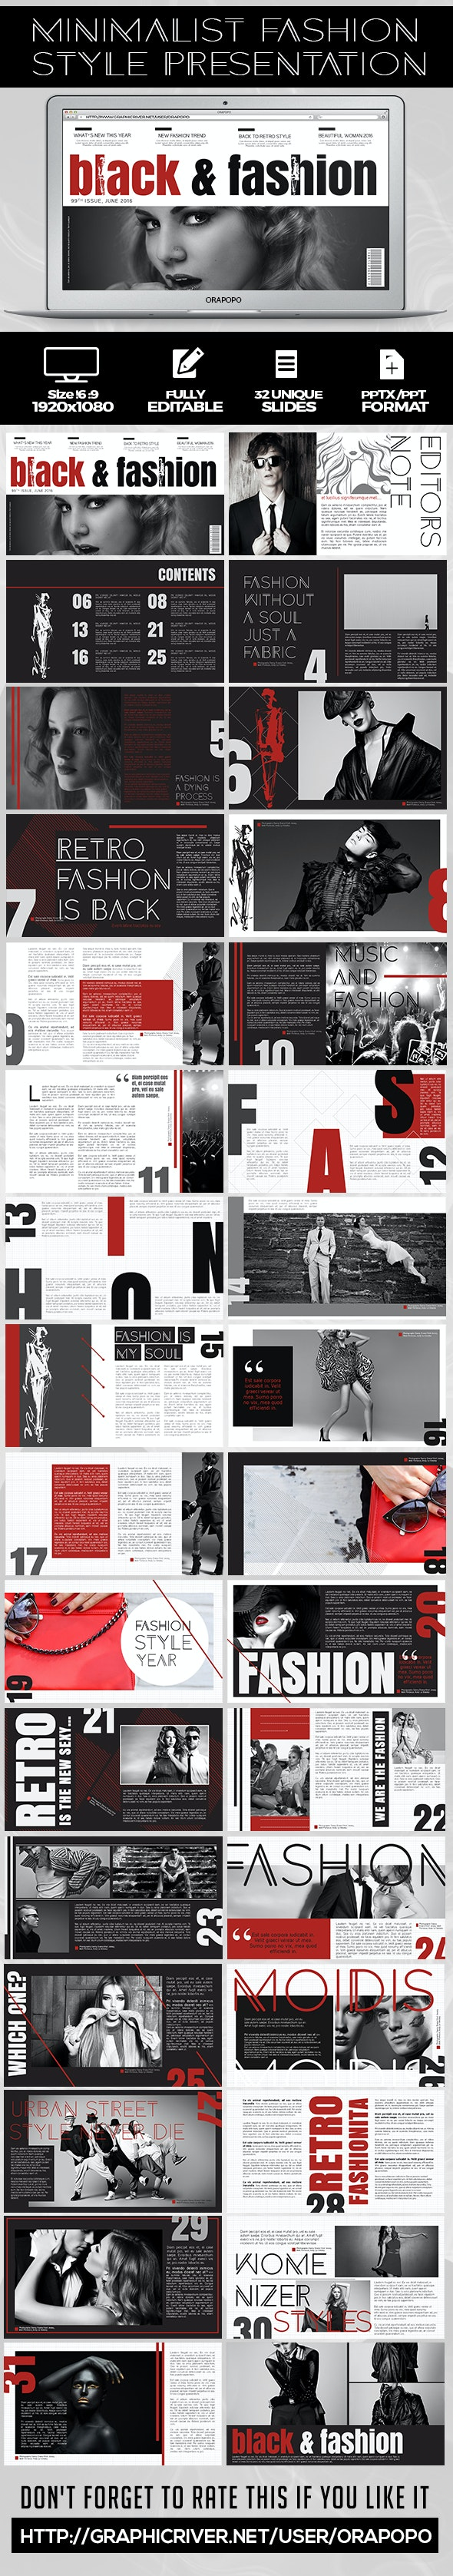 Minimalist Fashion Style Presentation - Creative PowerPoint Templates